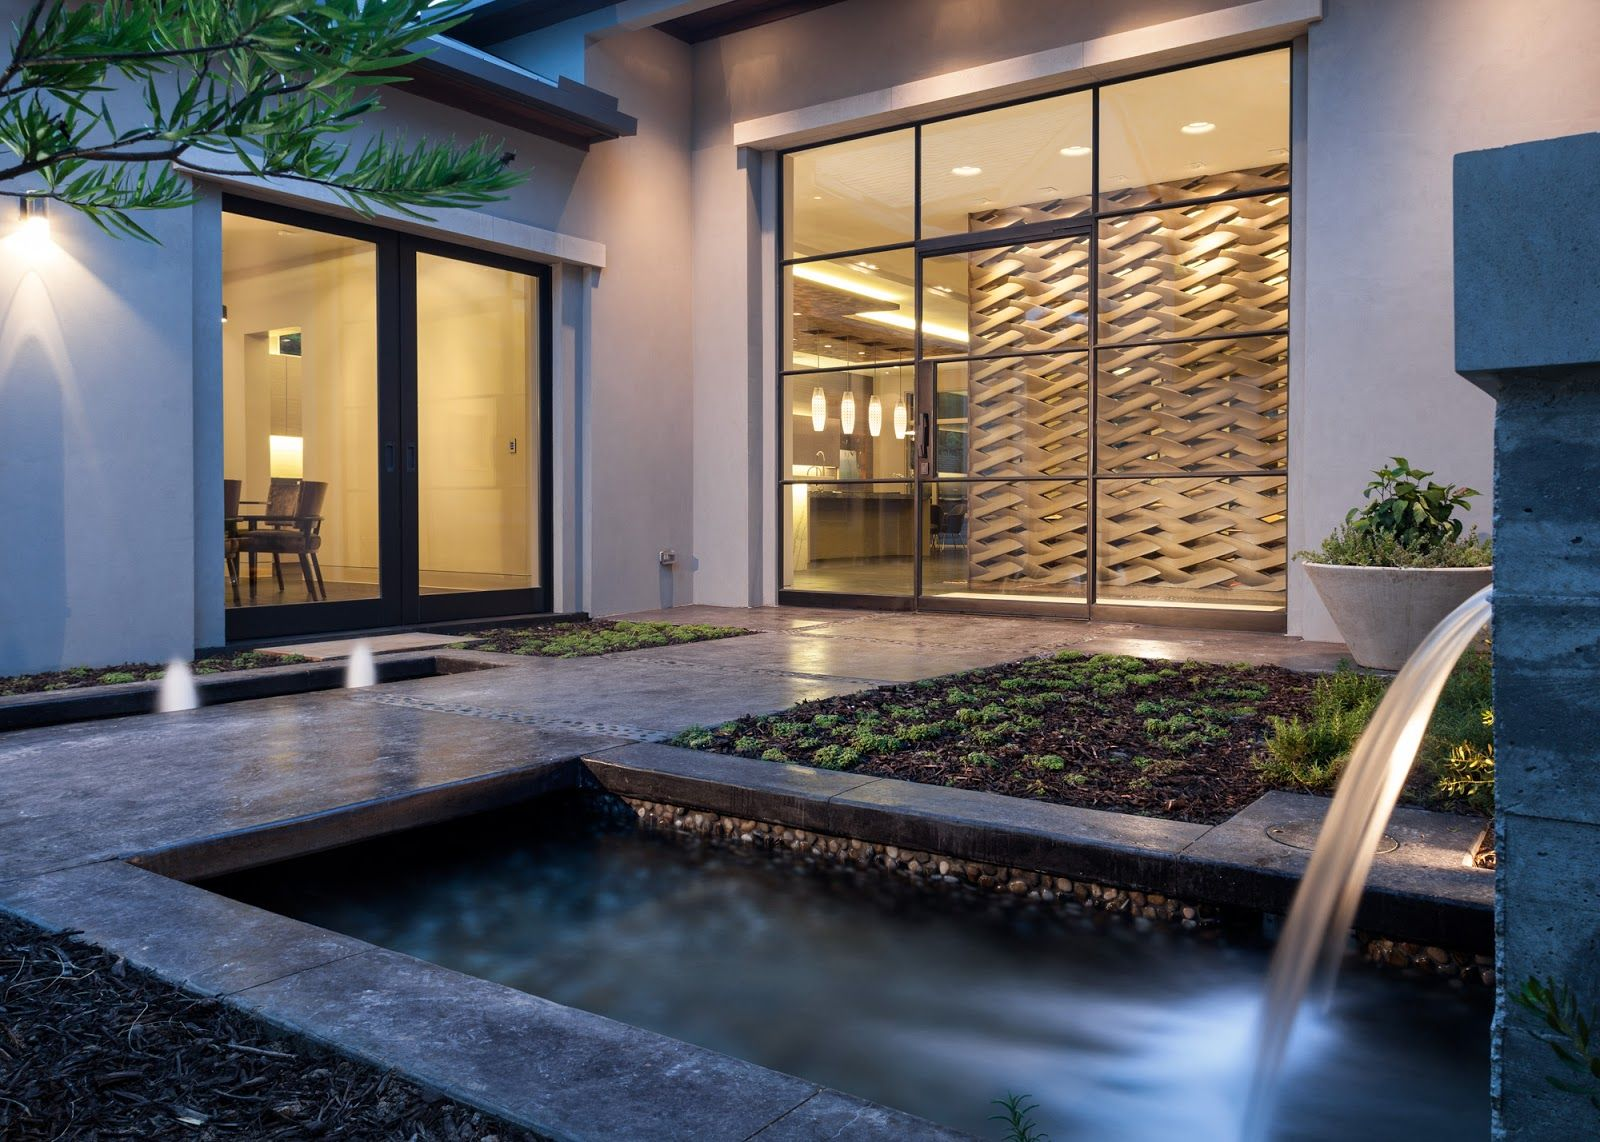 Portella Custom Steel Doors and Windows | Steel doors and windows, Steel doors, Pivot doors